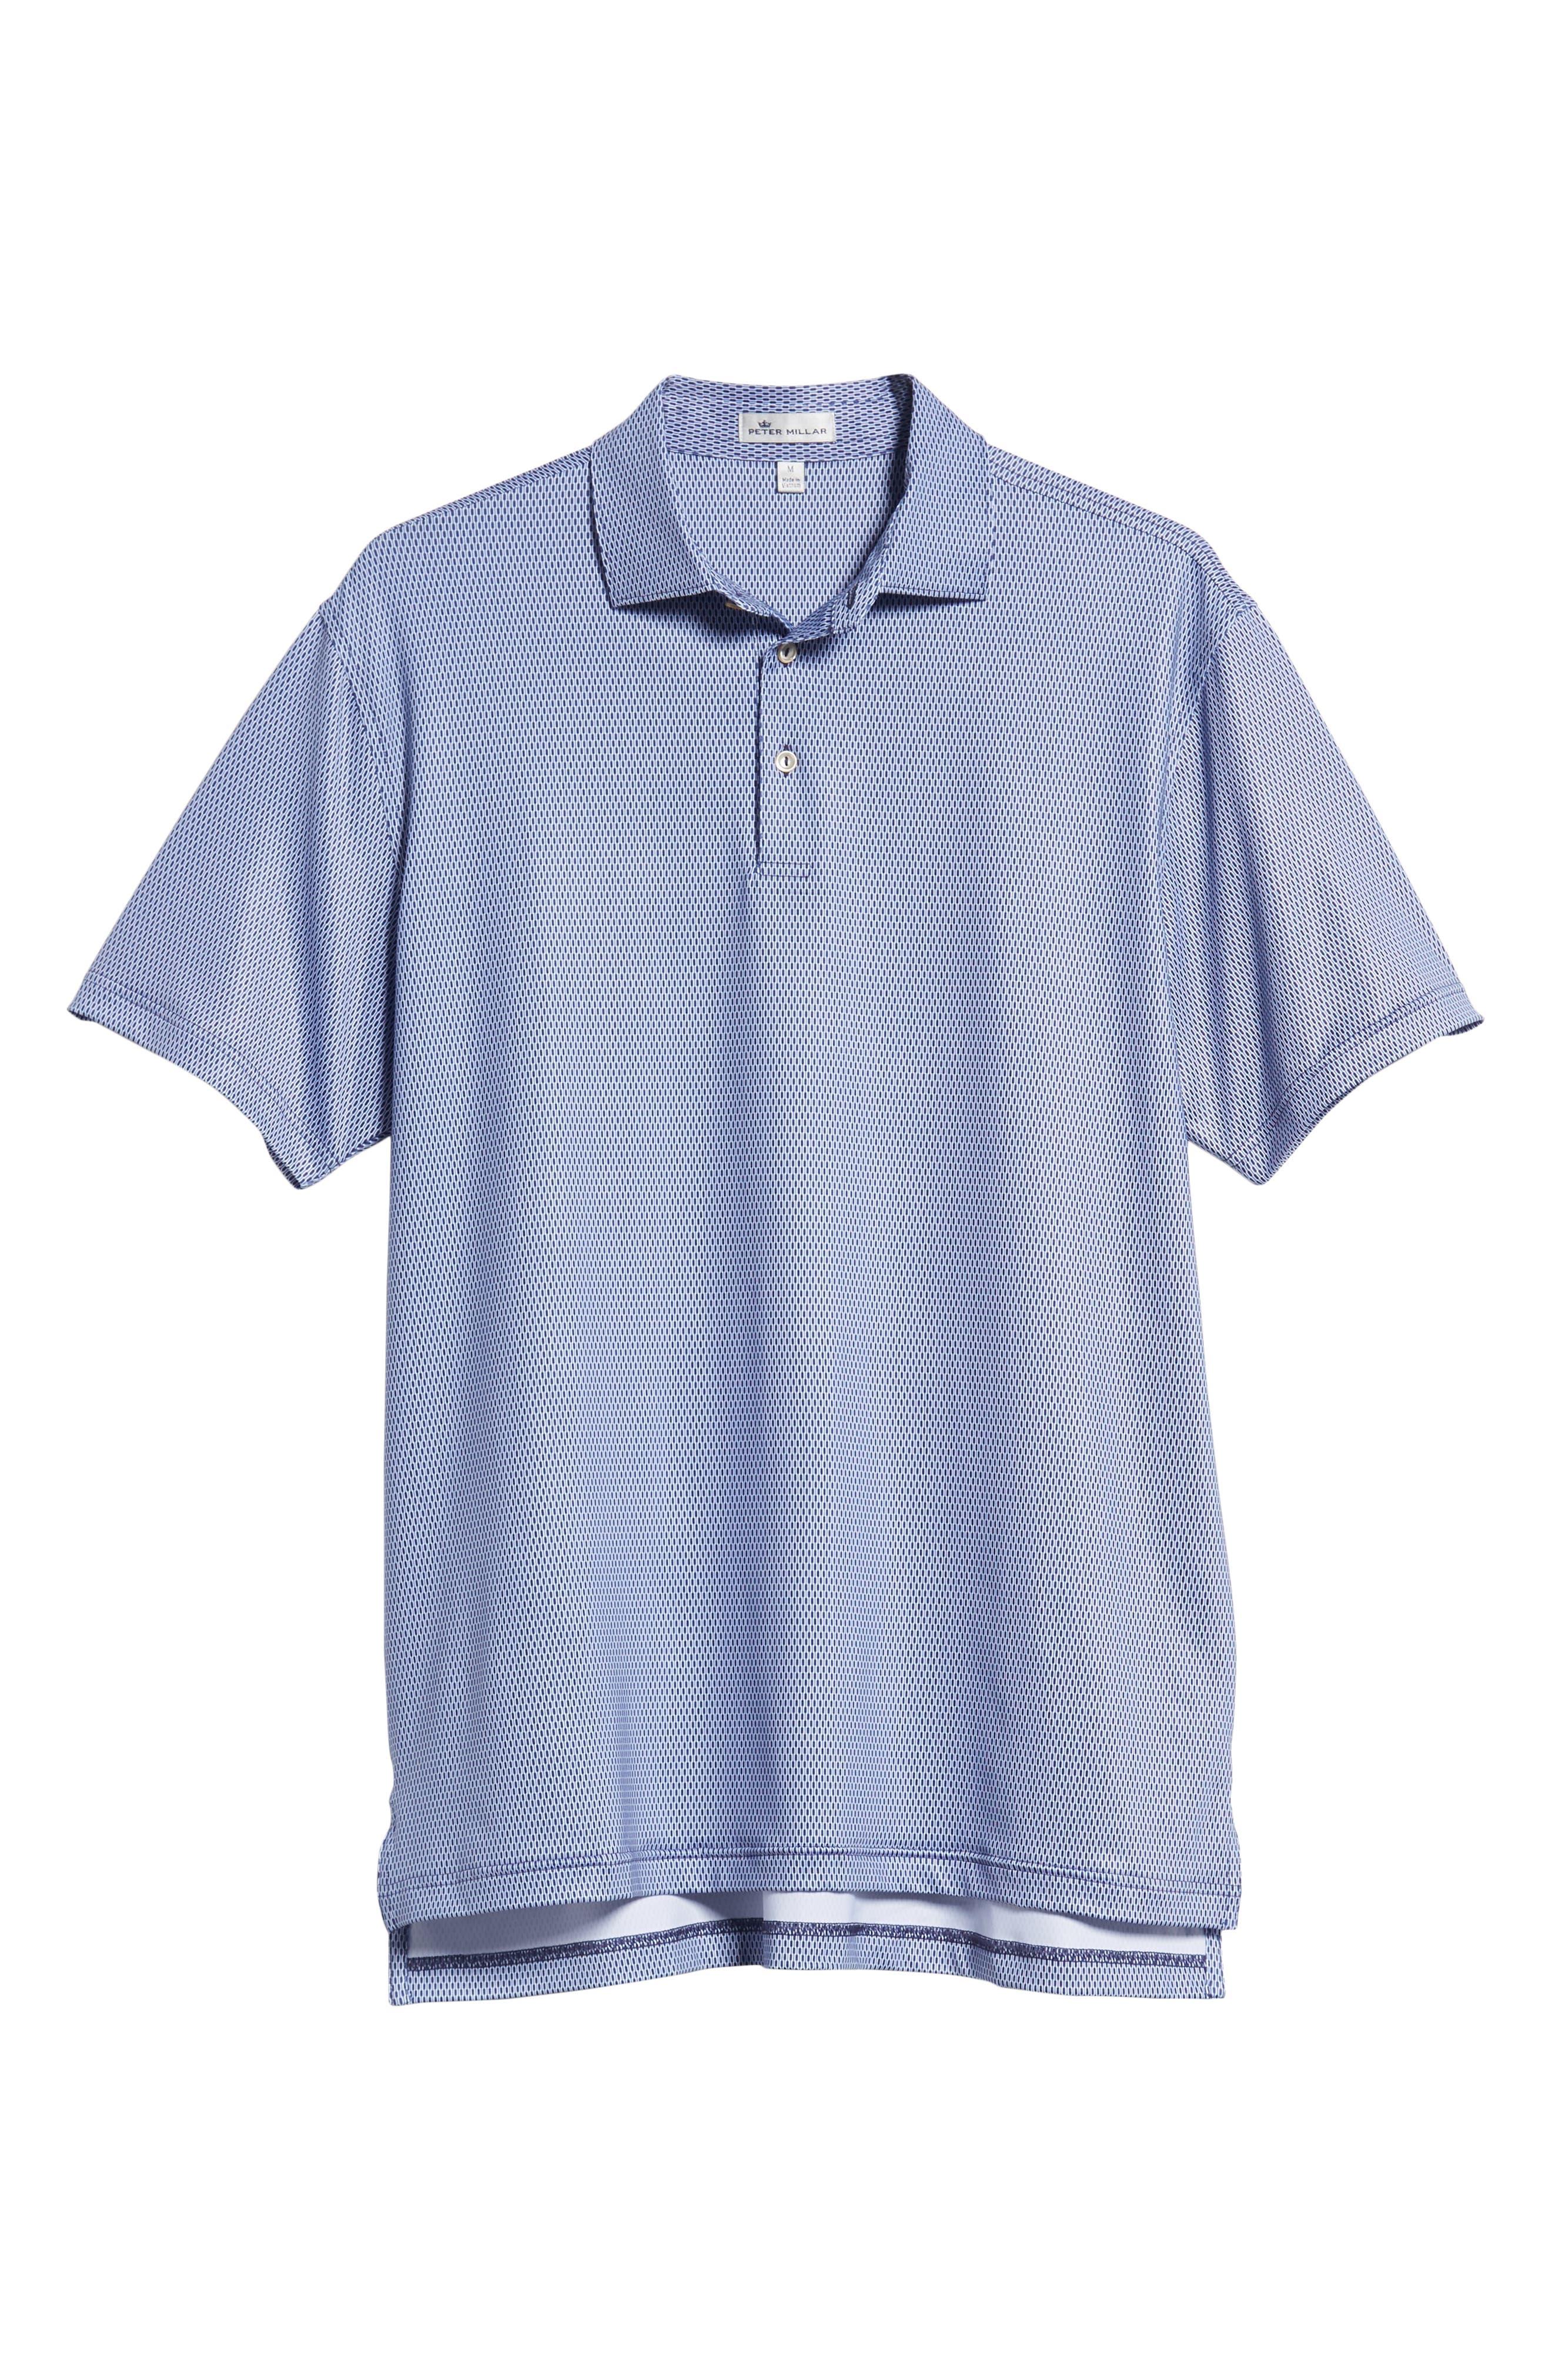 Latimer Classic Fit Links Print Golf Polo,                             Alternate thumbnail 6, color,                             410